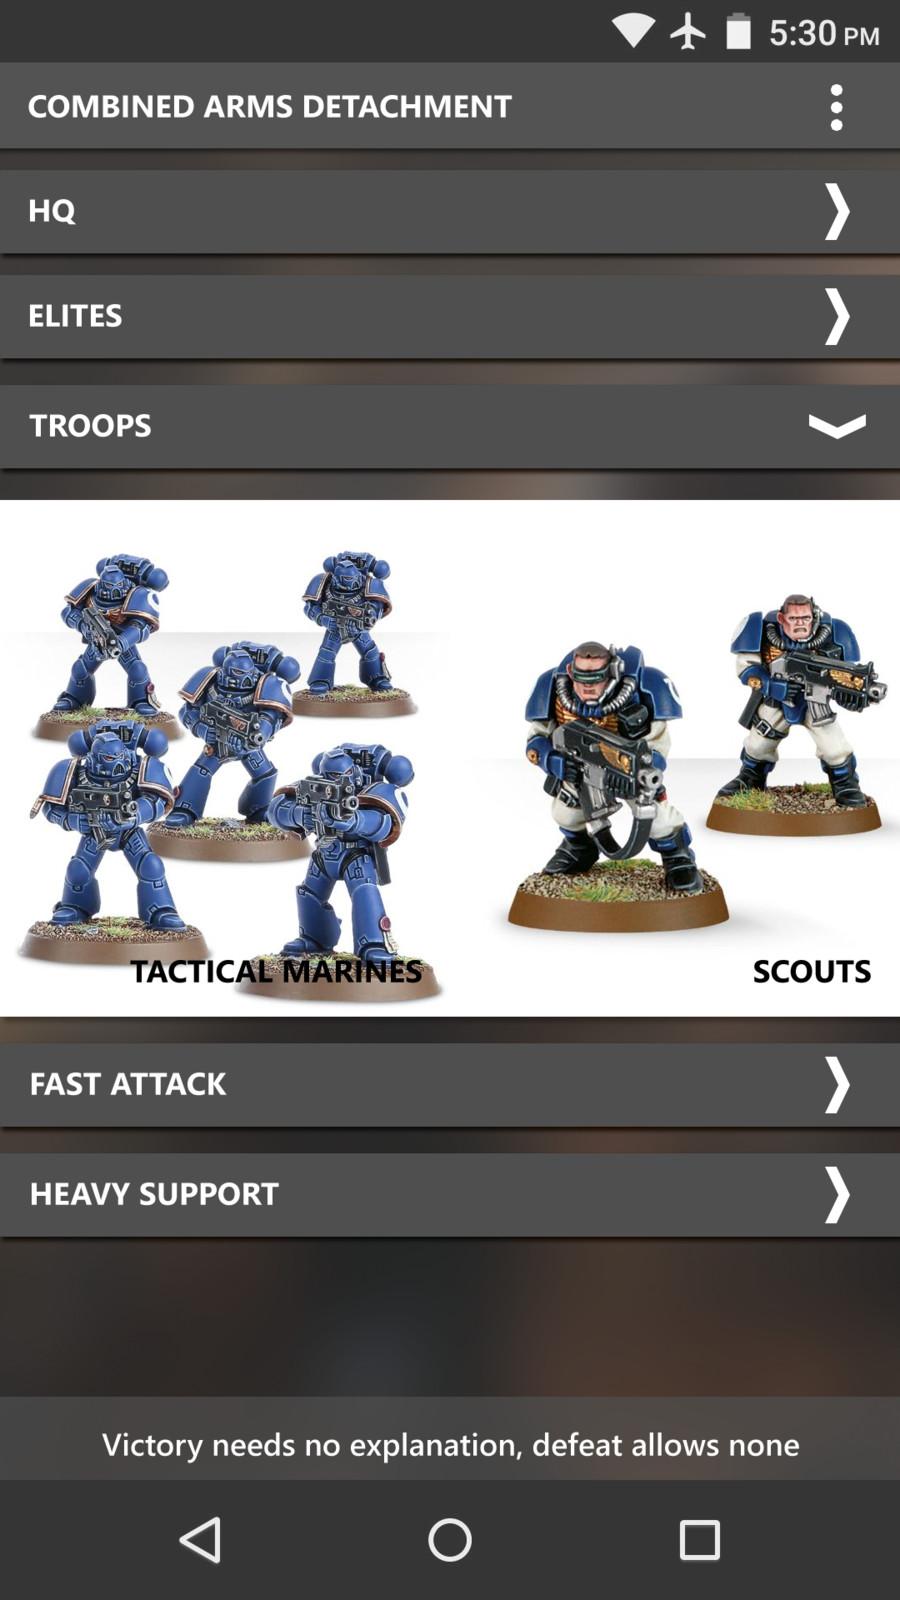 Troops breakdown